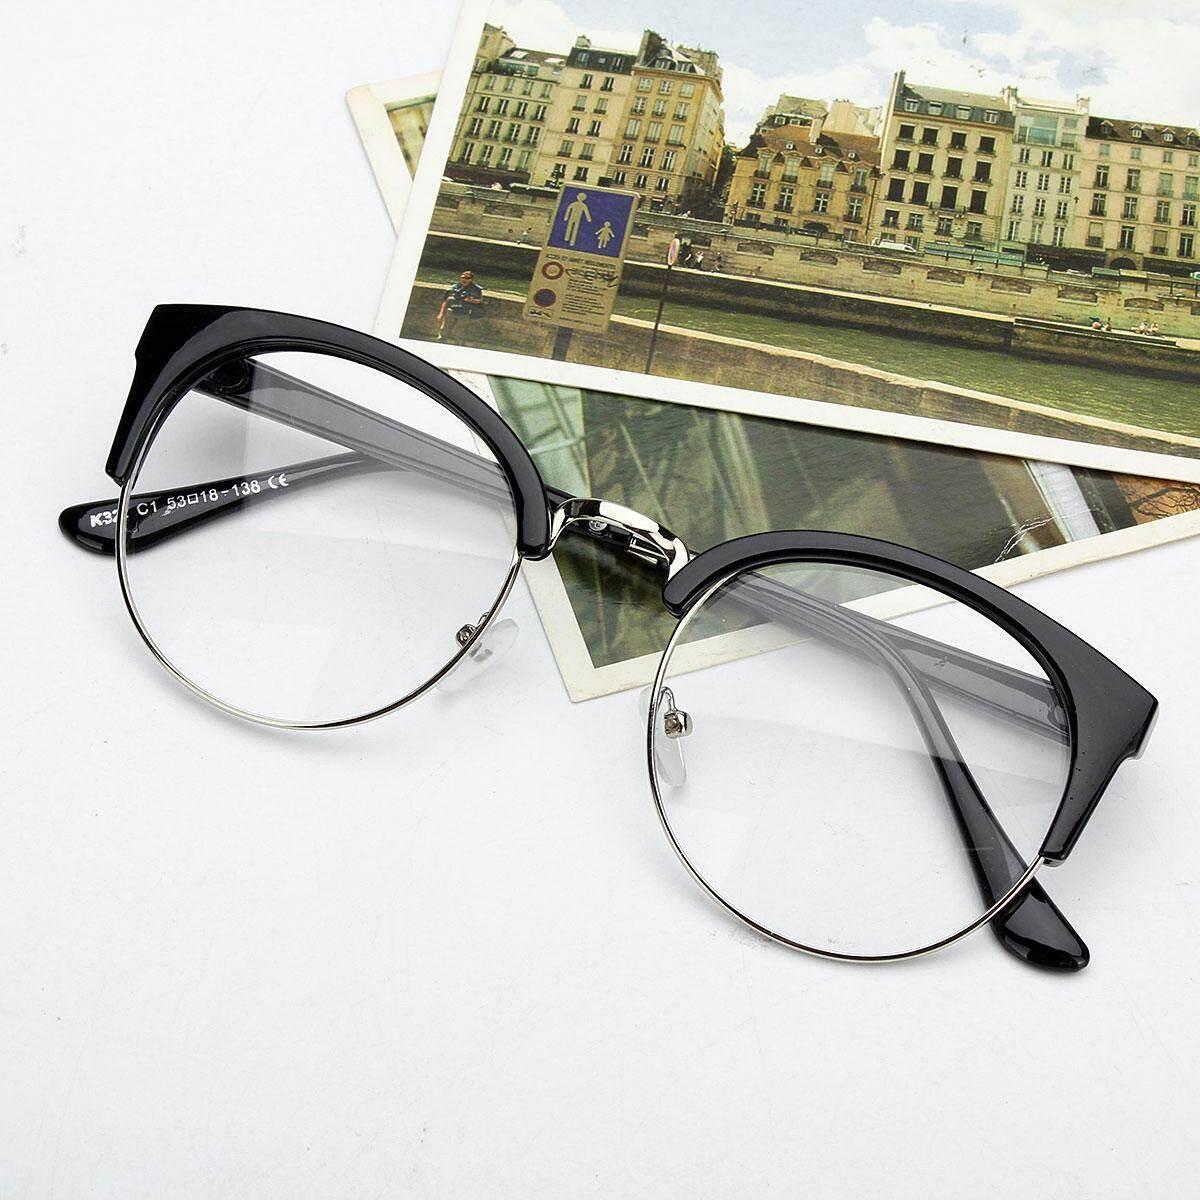 e16440eab5cf Retro Style Women Men Nerd Glasses Clear Lens Eyewear Round Metal Frame  Glasses  bright black